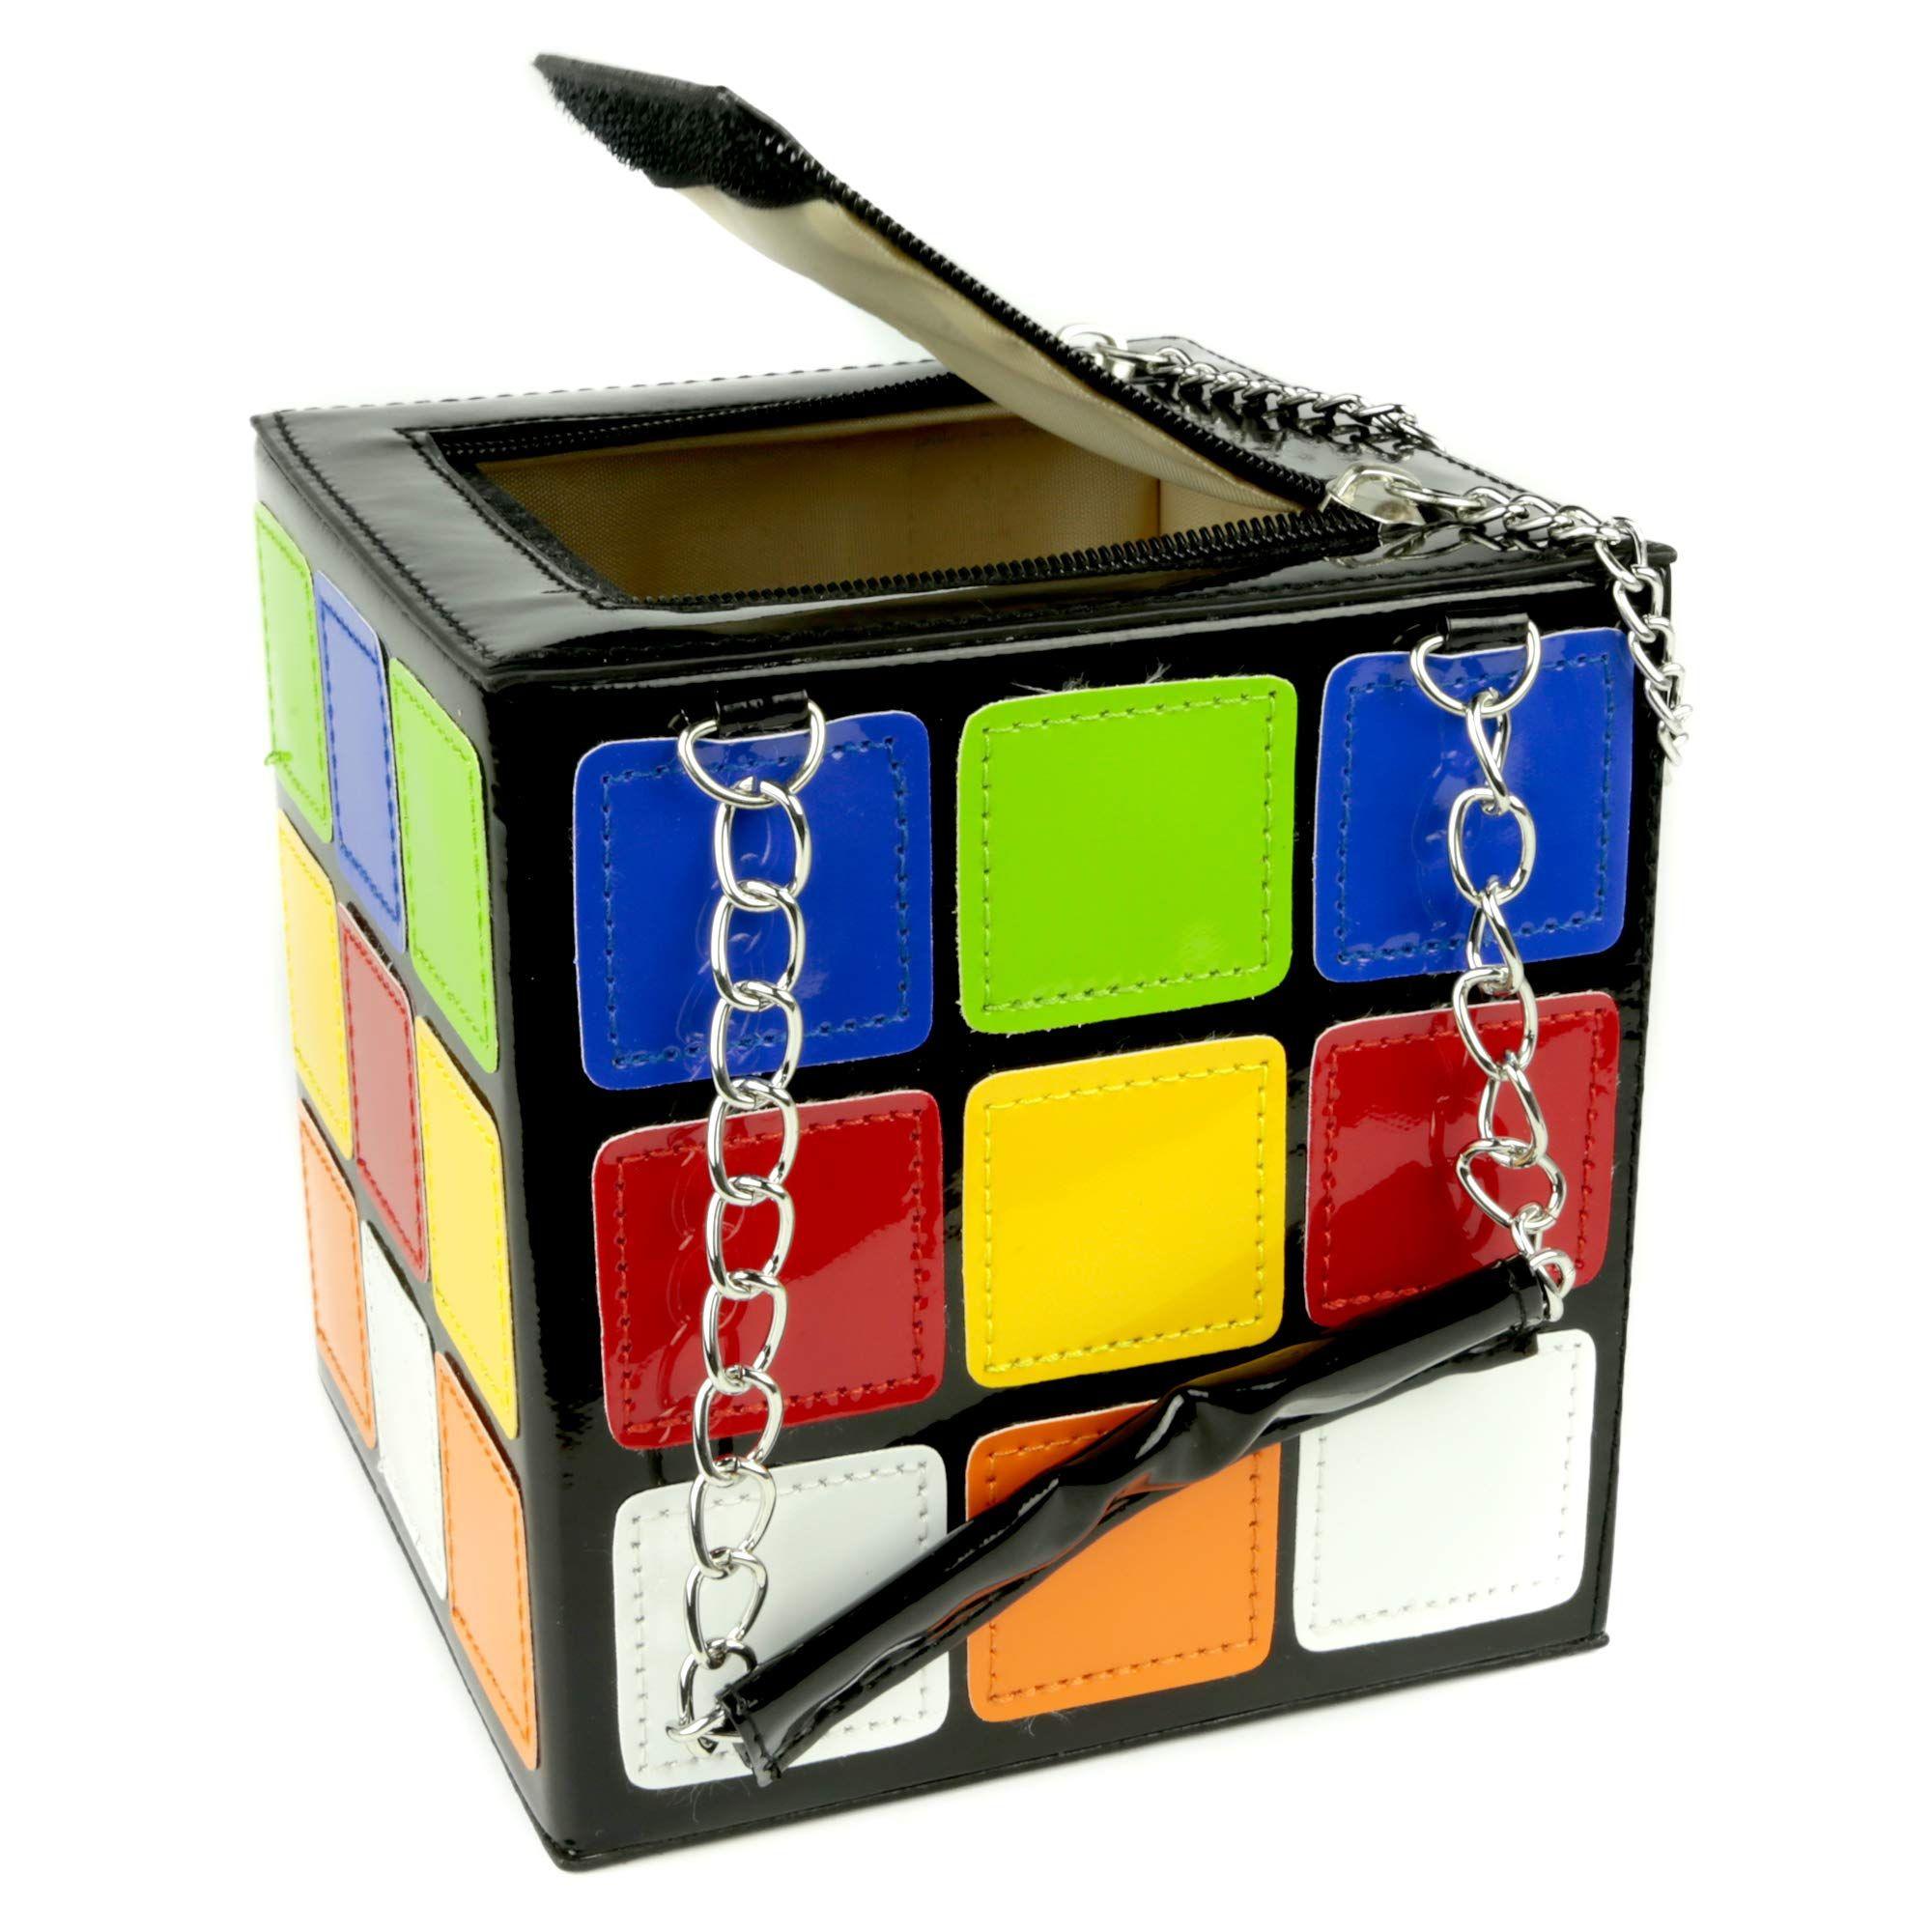 HXQ Novelty Colorful Magic Cube Handbag,Fashion Rubiks Cute Purses for Women Girl